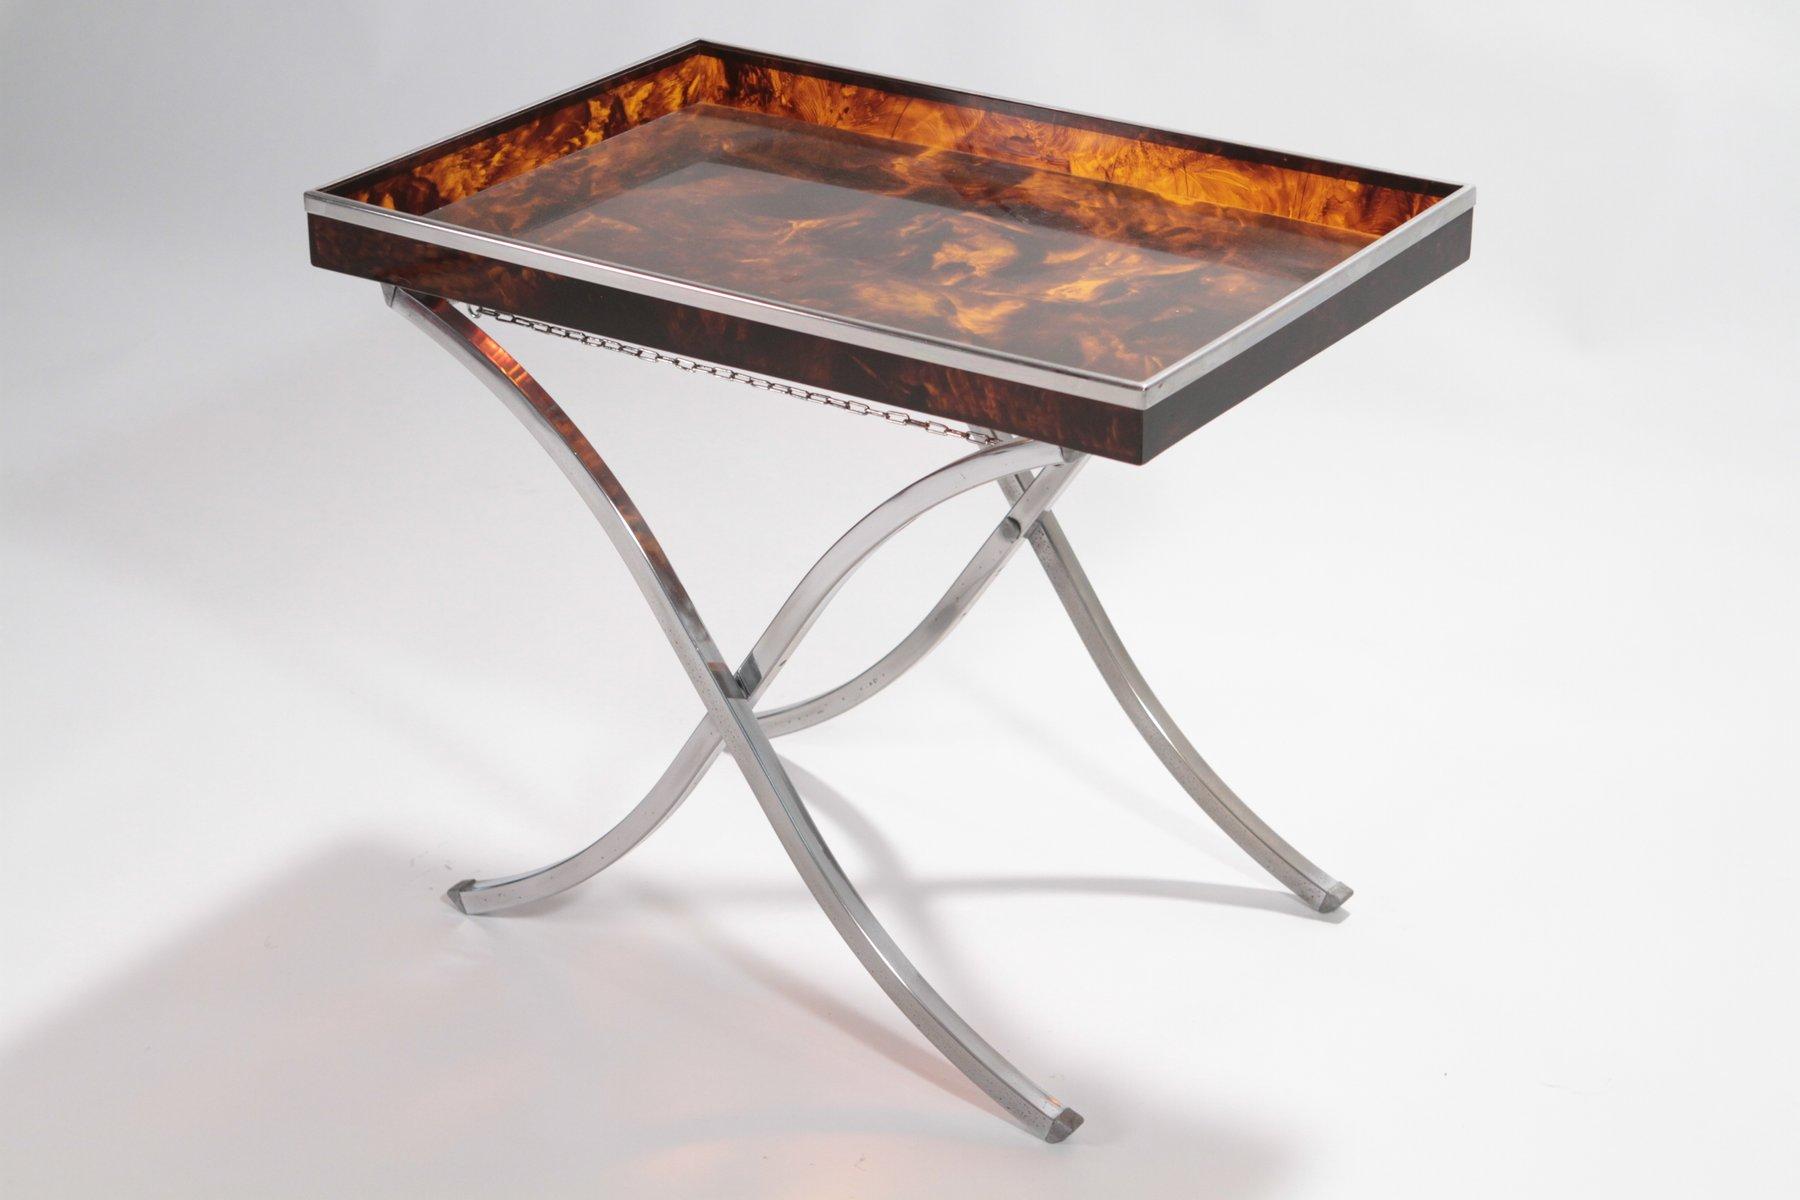 Butleru0027s Tray Table, 1970s